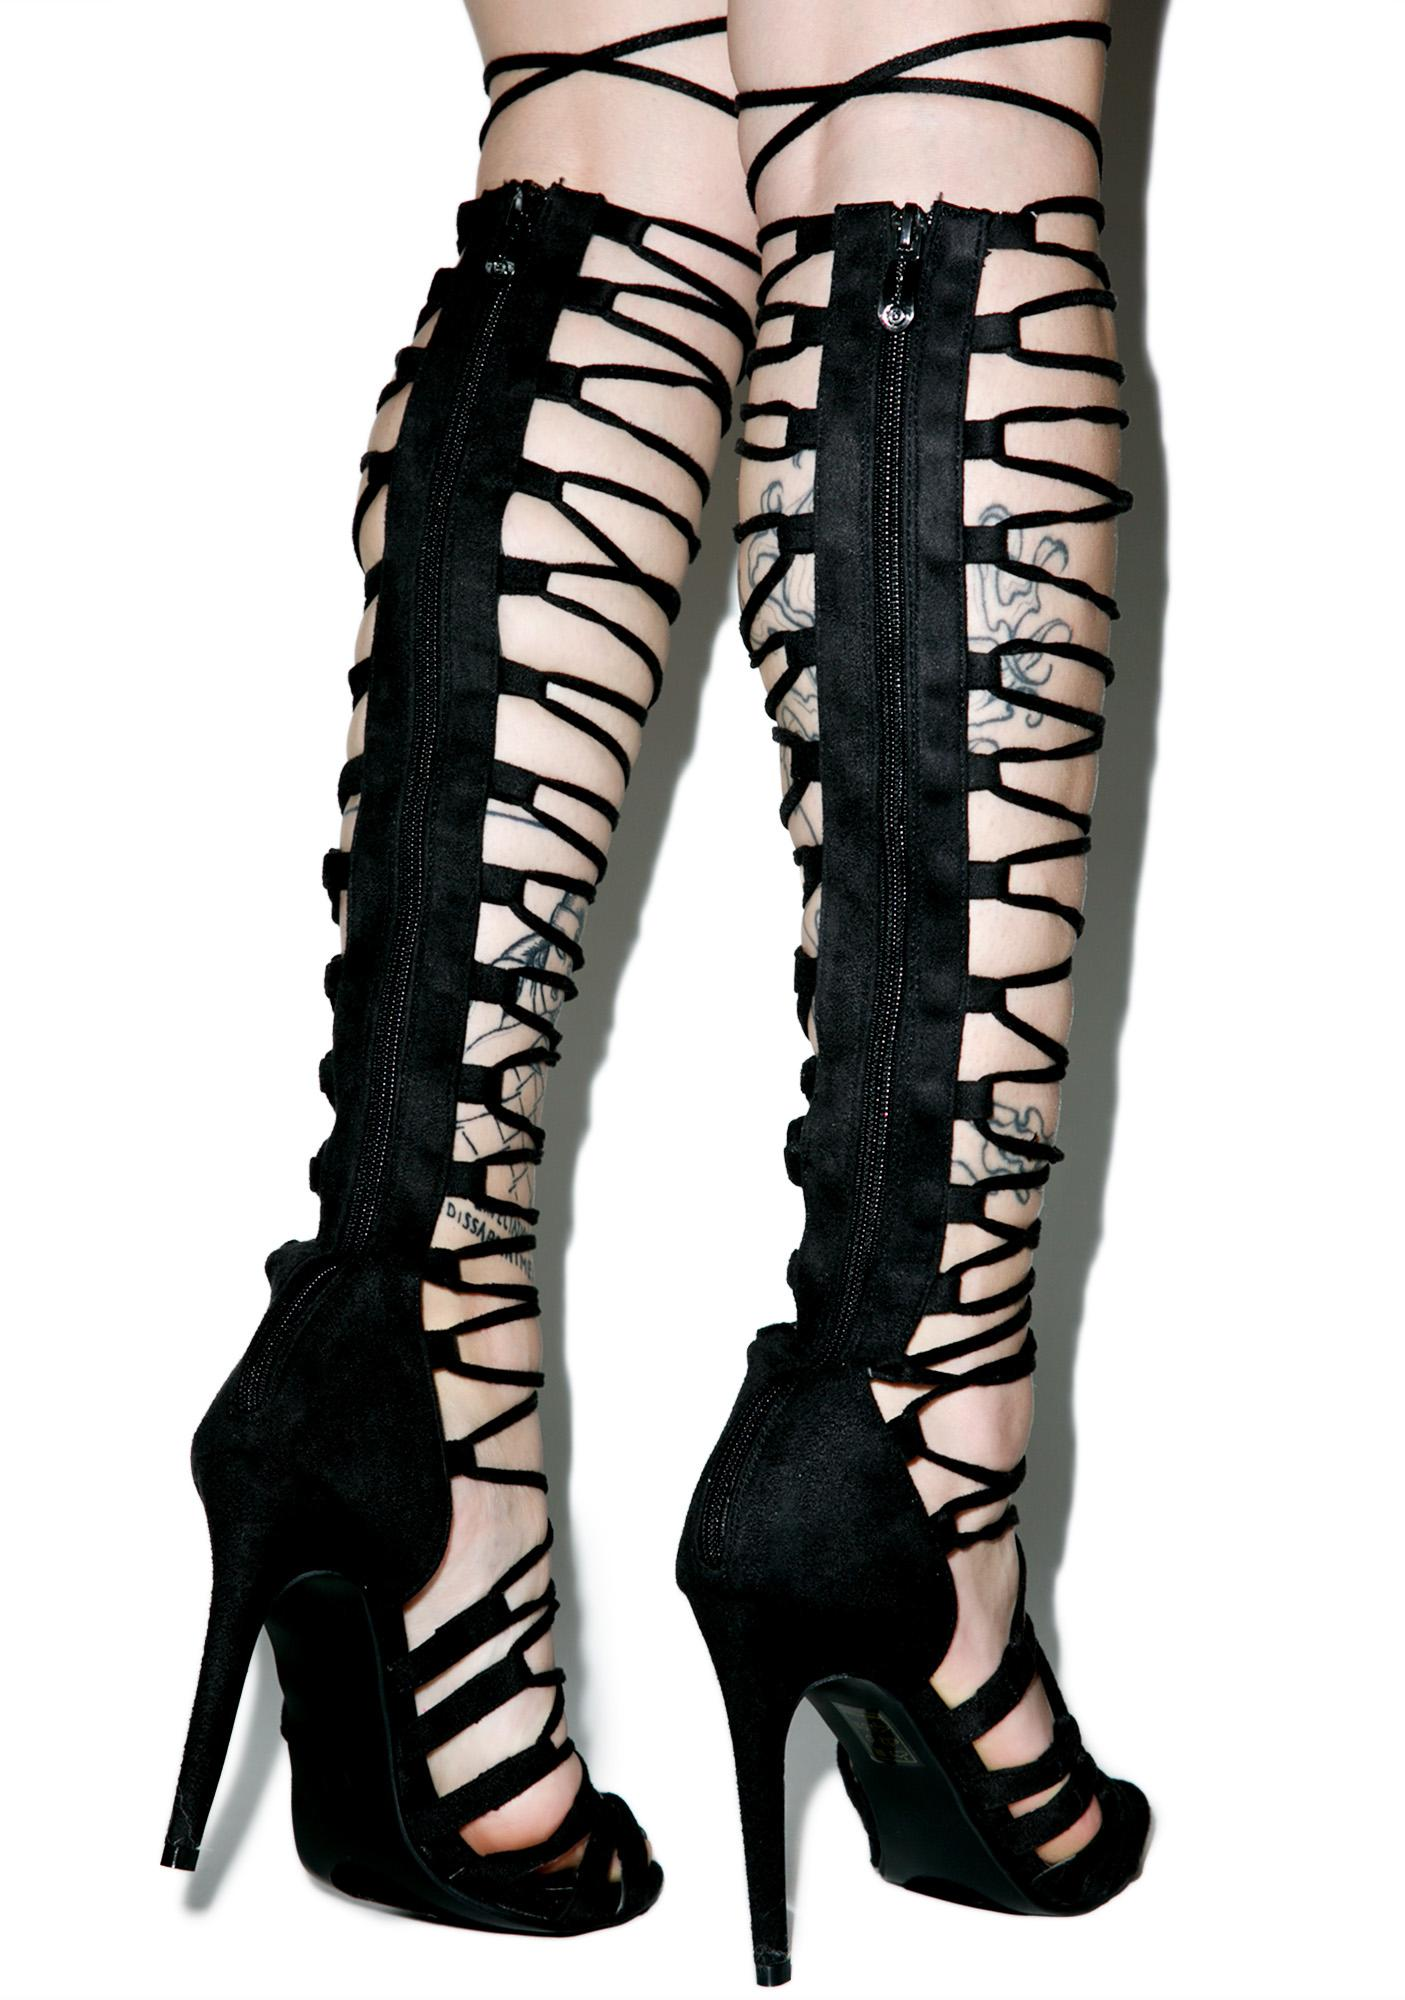 Supermodel Strappy Heels